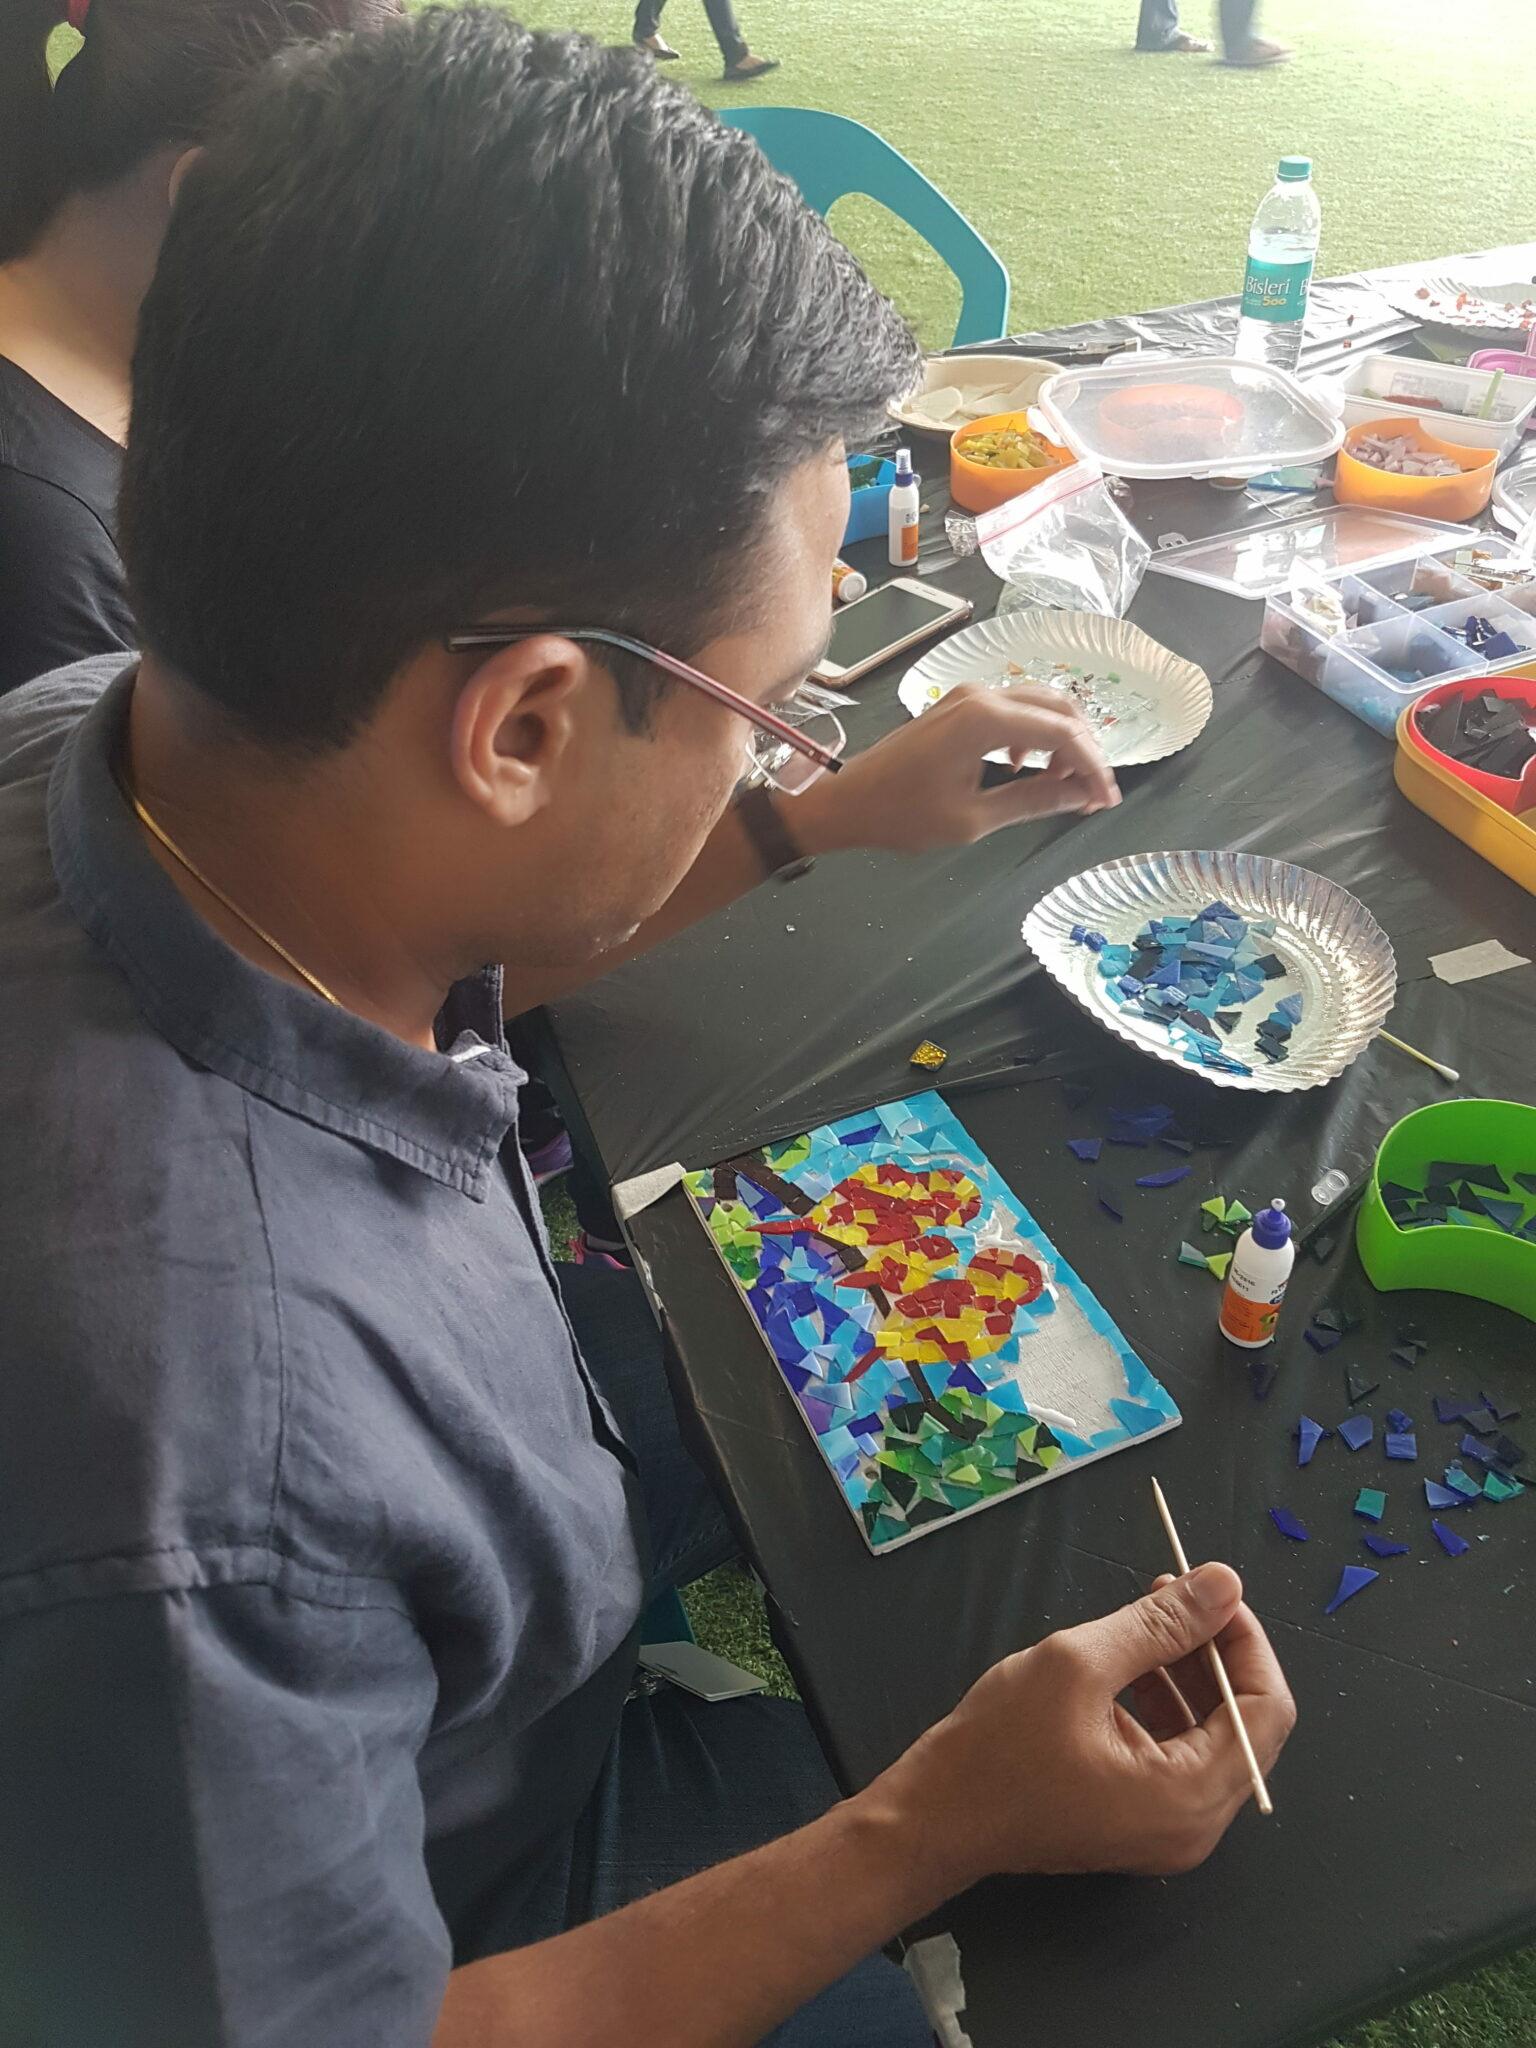 Paper Mosaic workshop at LinkedIn